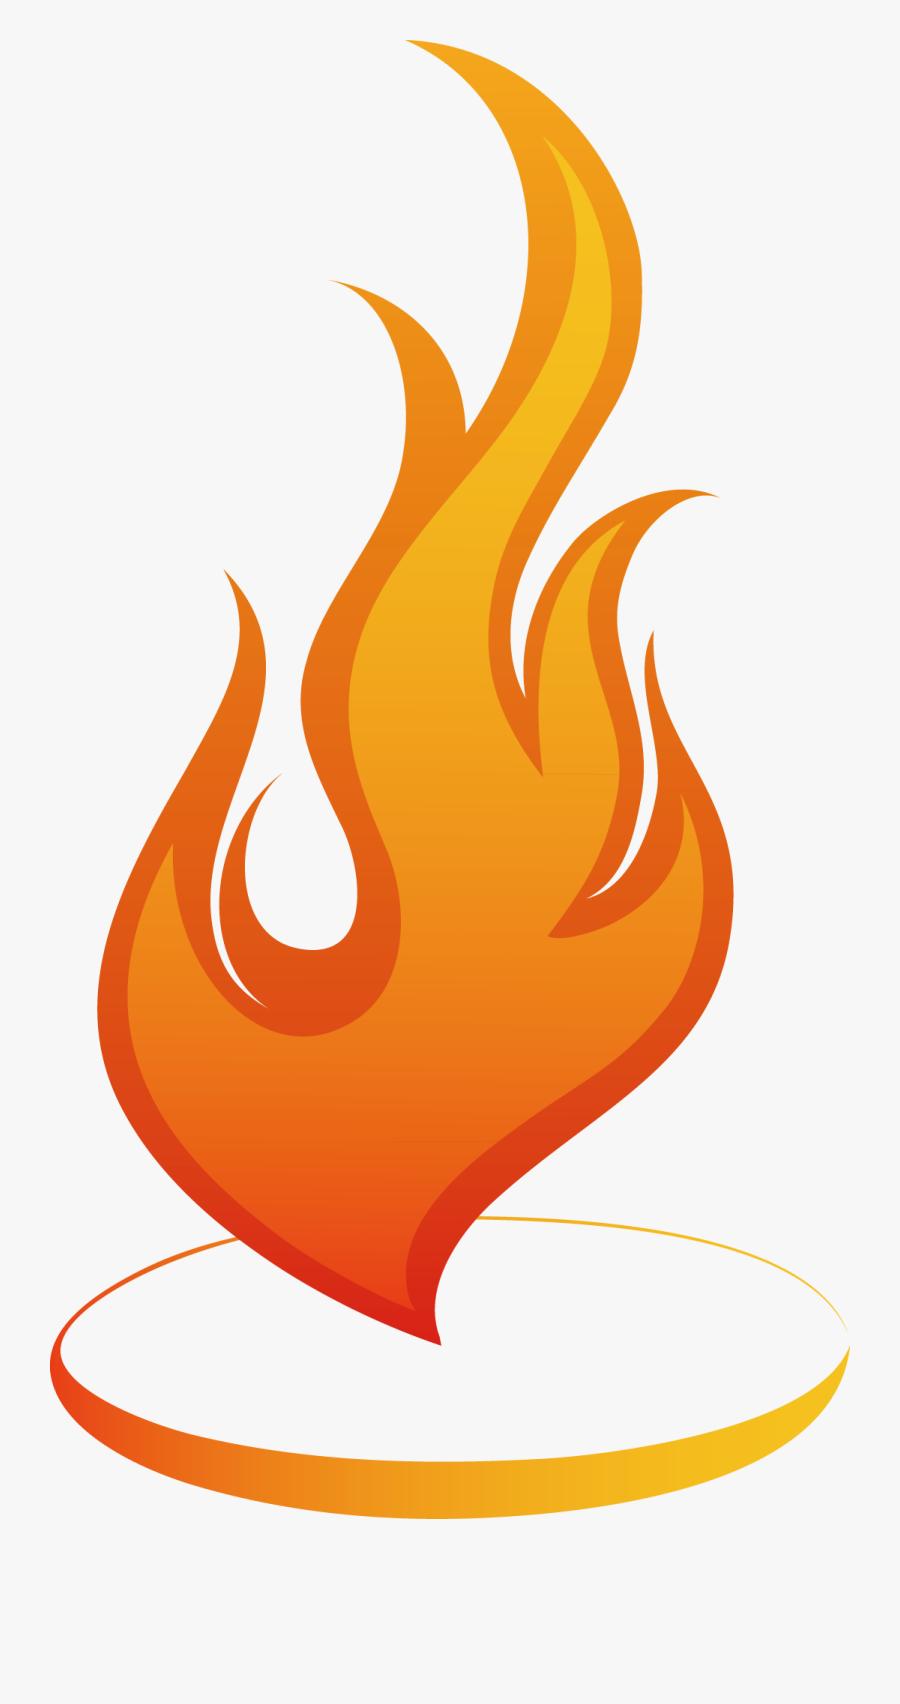 Png Free Download Euclidean Clip Art Fire Heart Decoration - Fire Flame Clip Art, Transparent Clipart